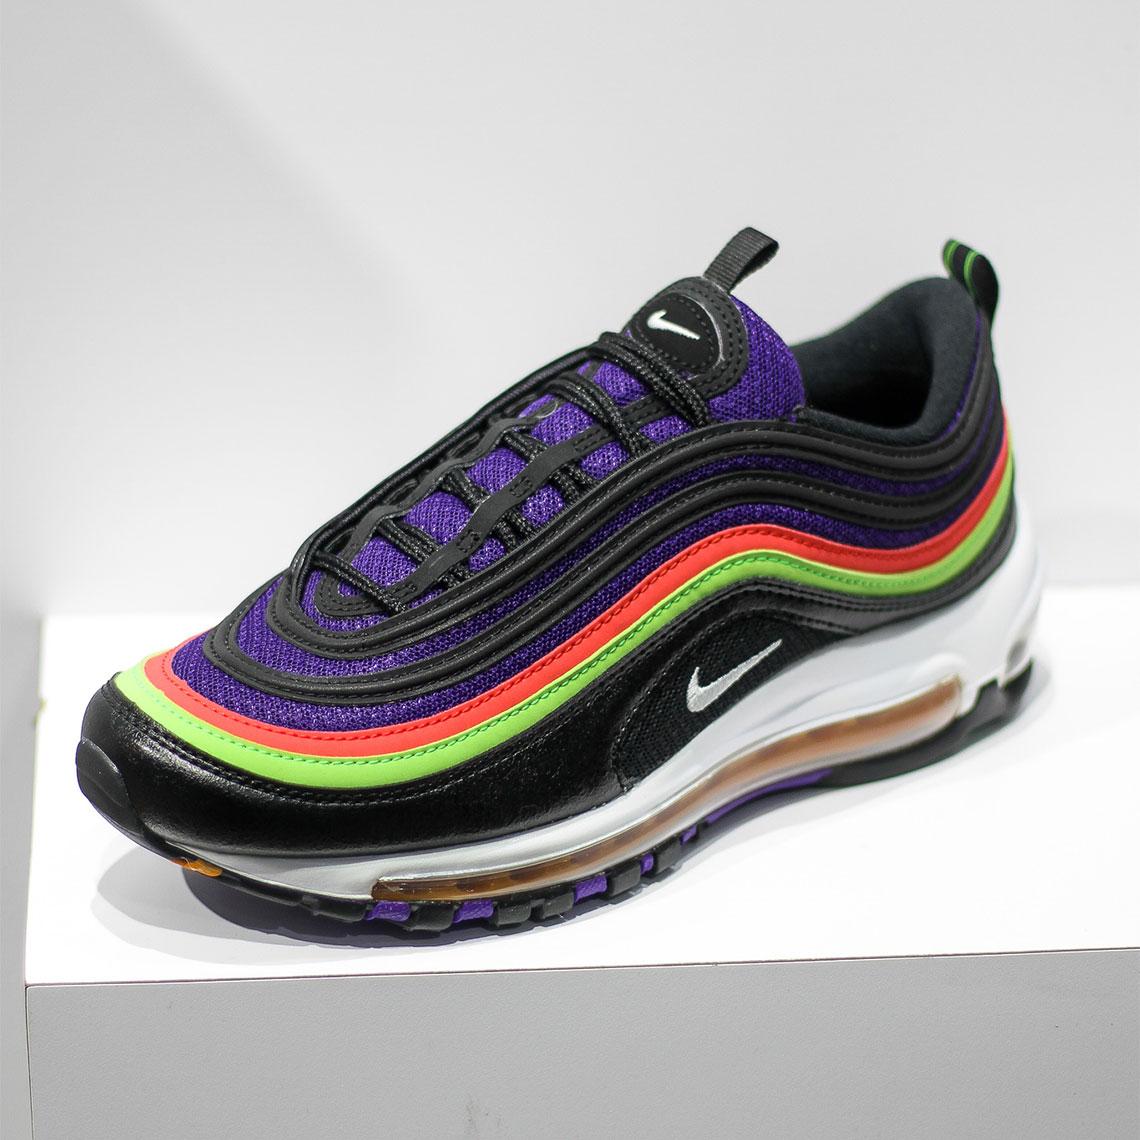 Nike Air Max 97 Black Purple Cu4890 001 Sneakernews Com